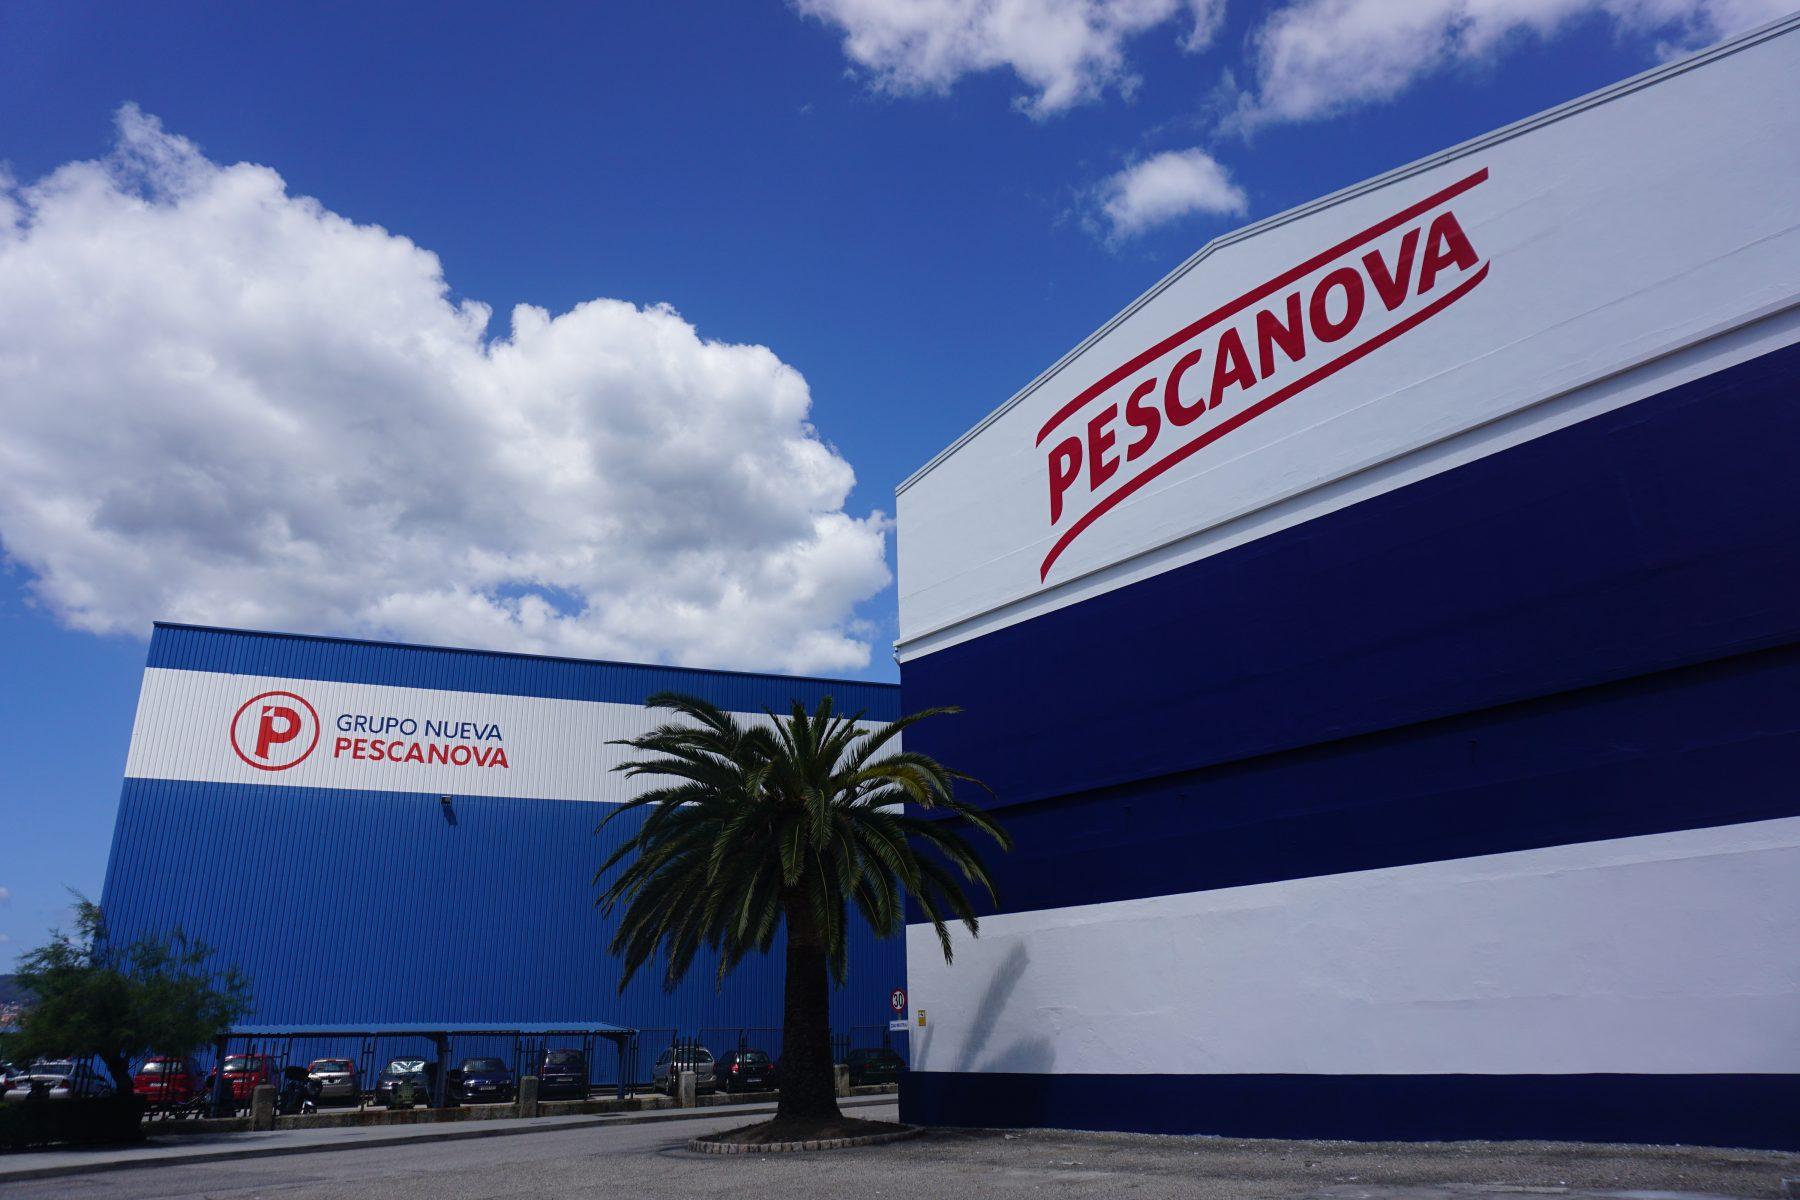 Nueva Pescanova